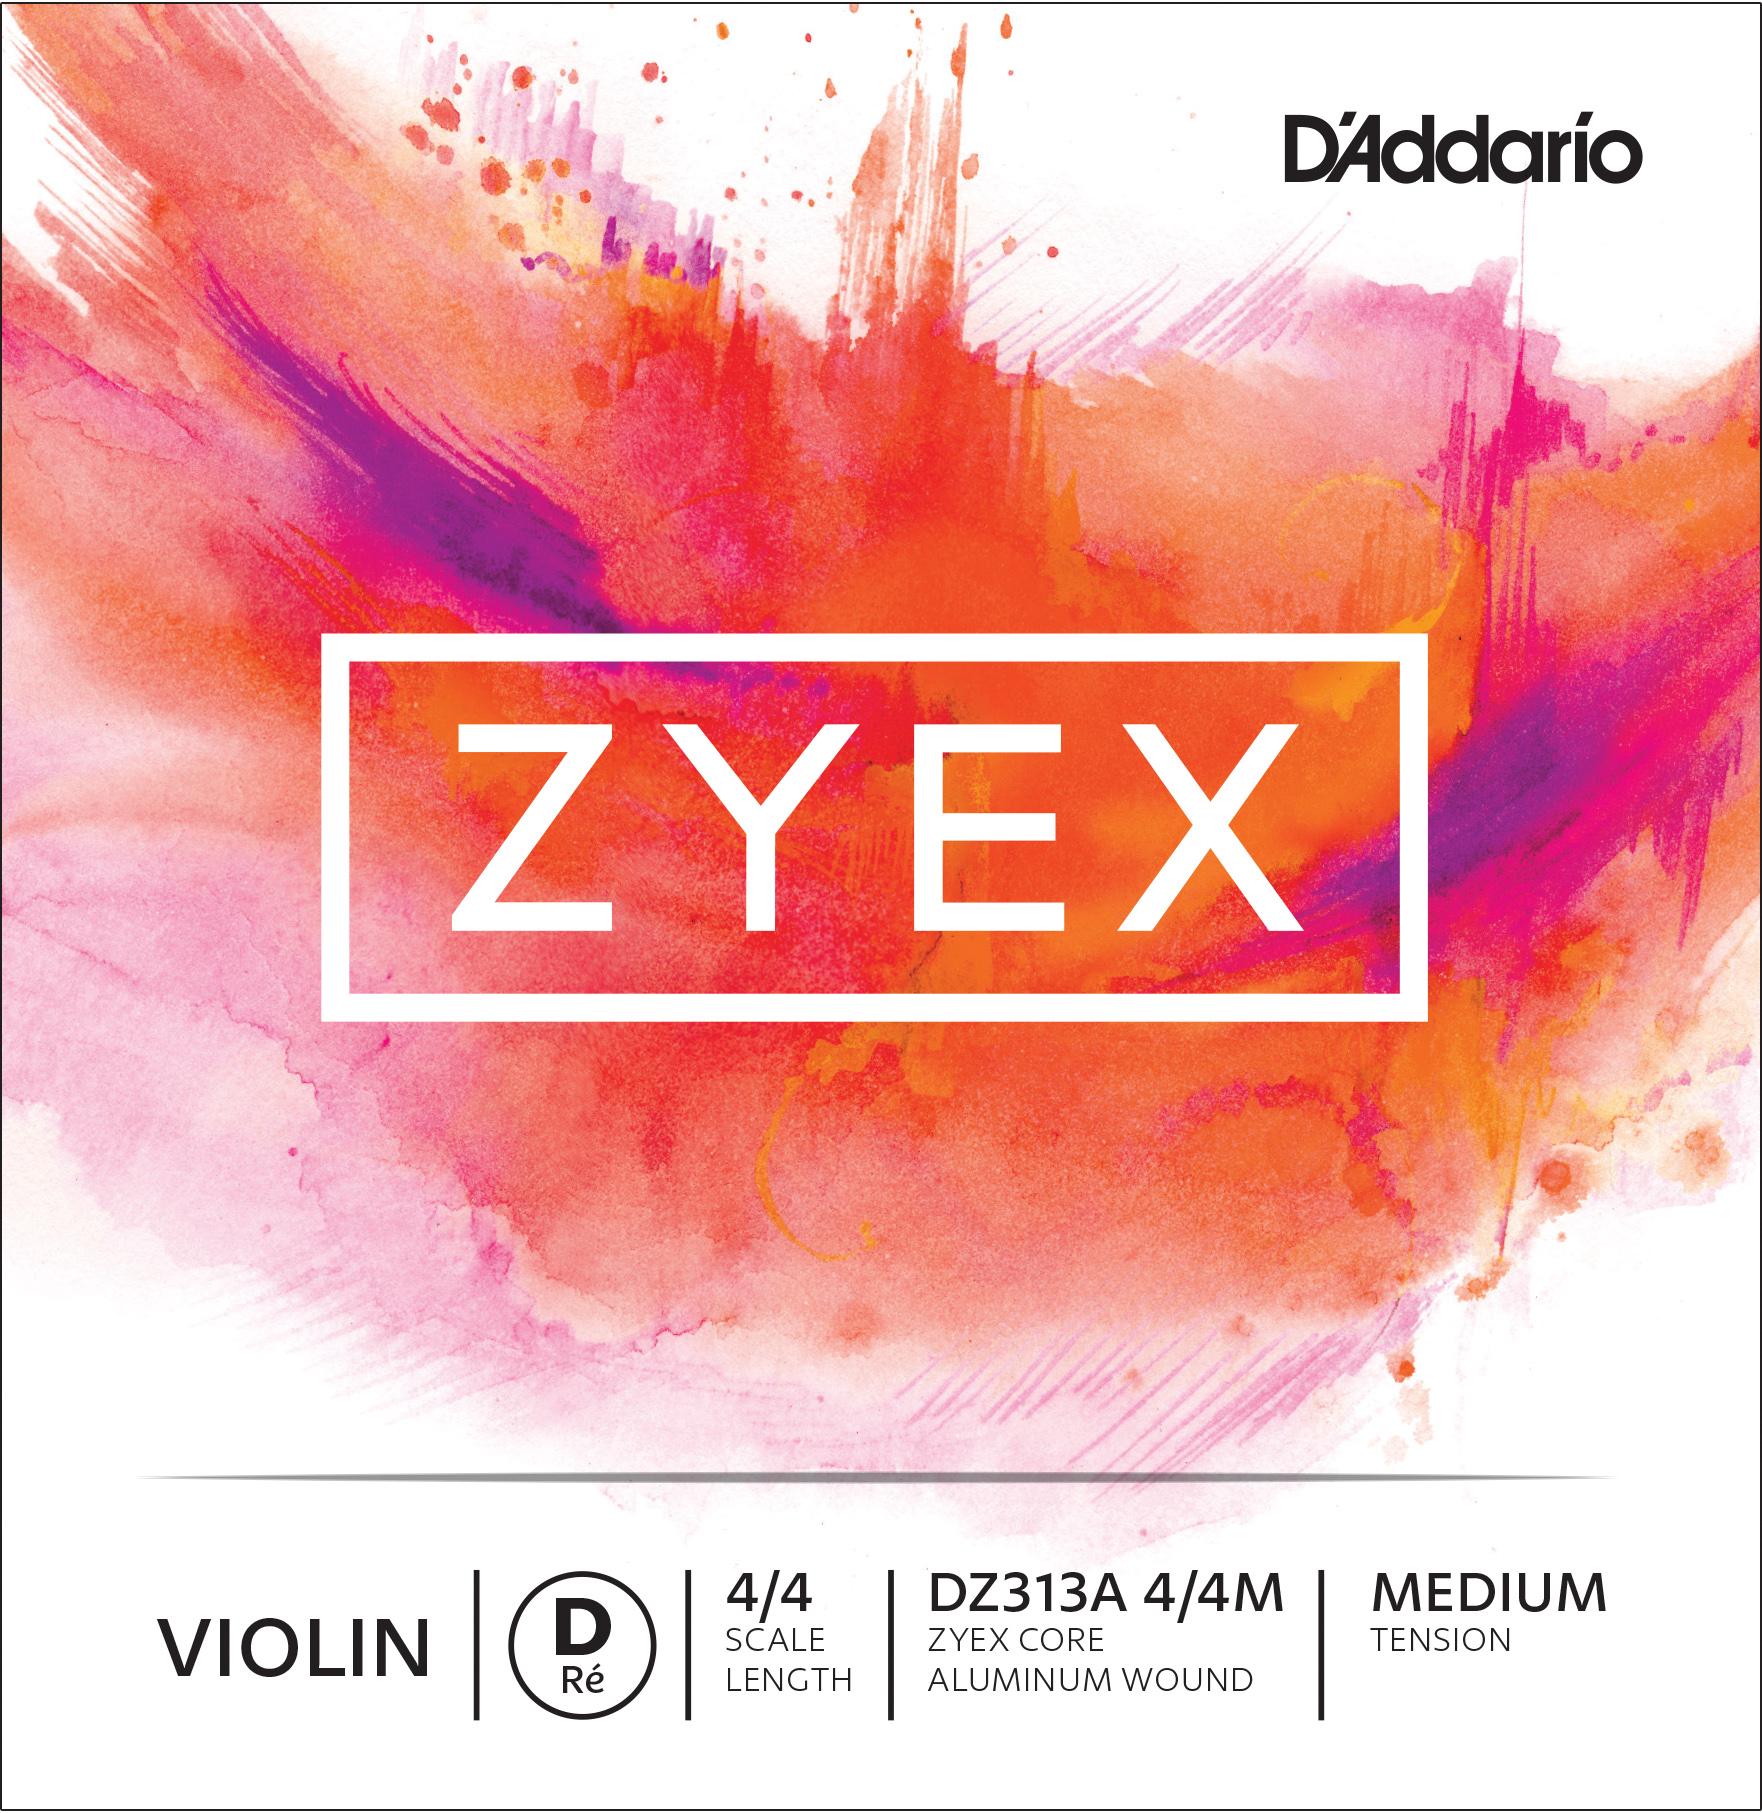 D'Addario Zyex Violin String, D Aluminium   D'Addario